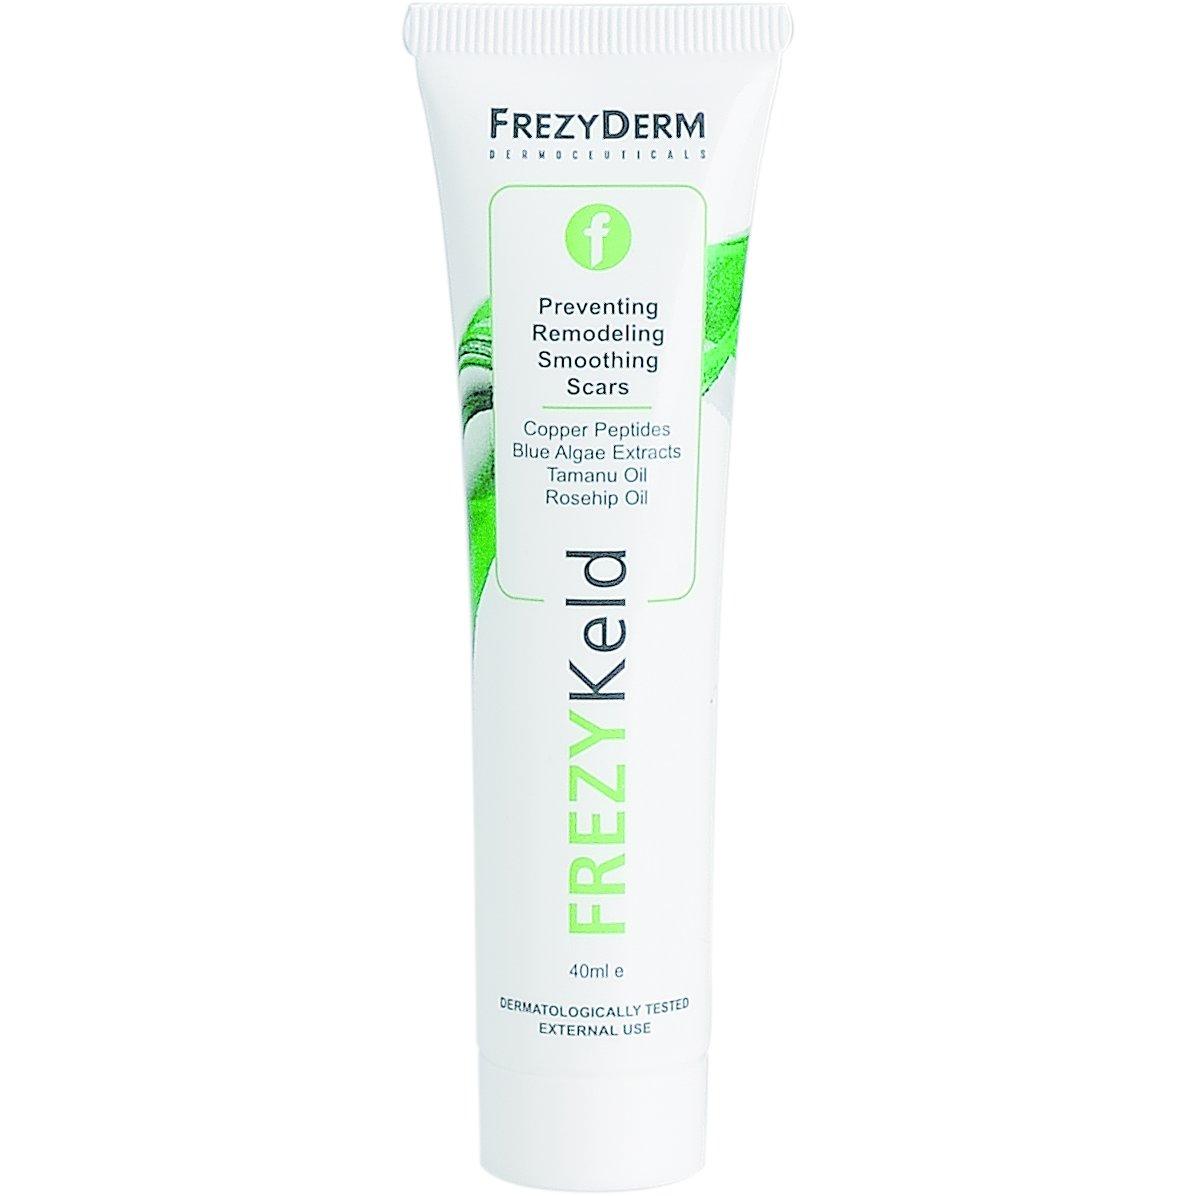 Frezyderm Frezykeld Cream Κρέμα για τις Ουλές 40ml